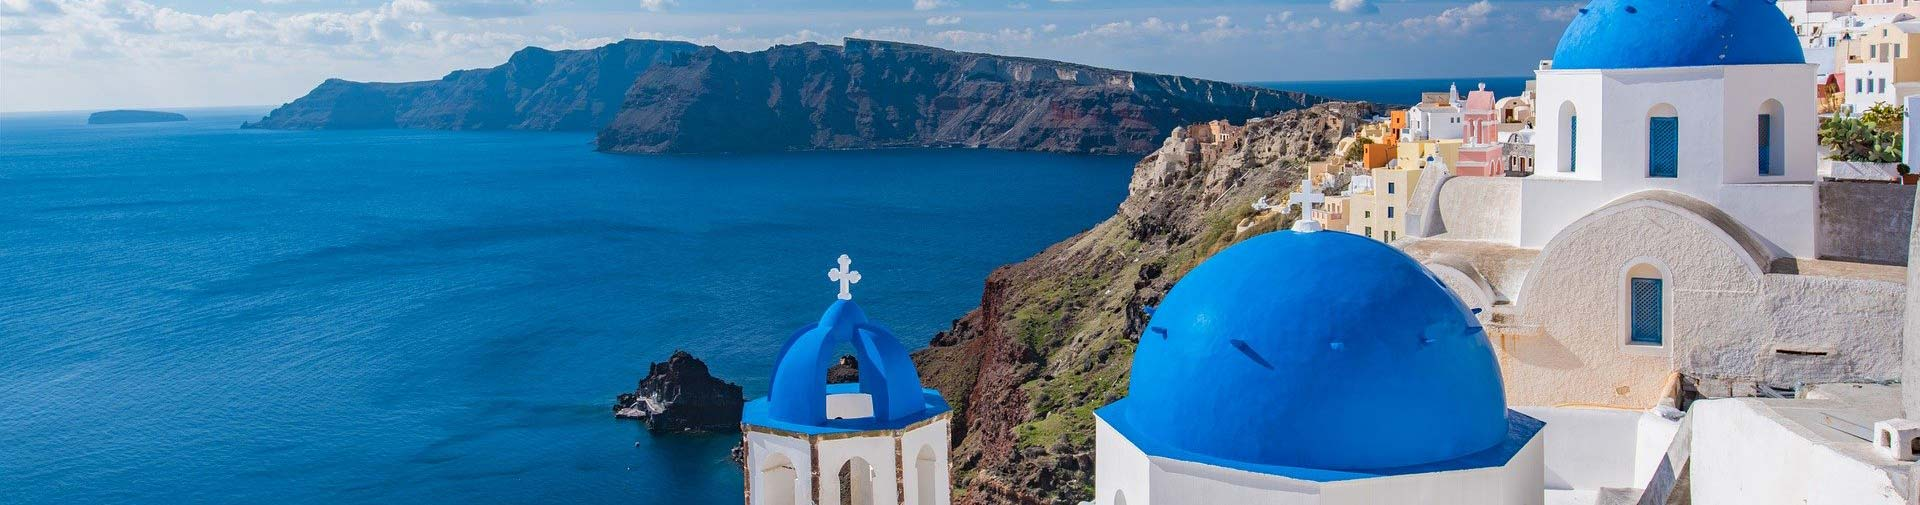 Jetzt Griechenland entdecken